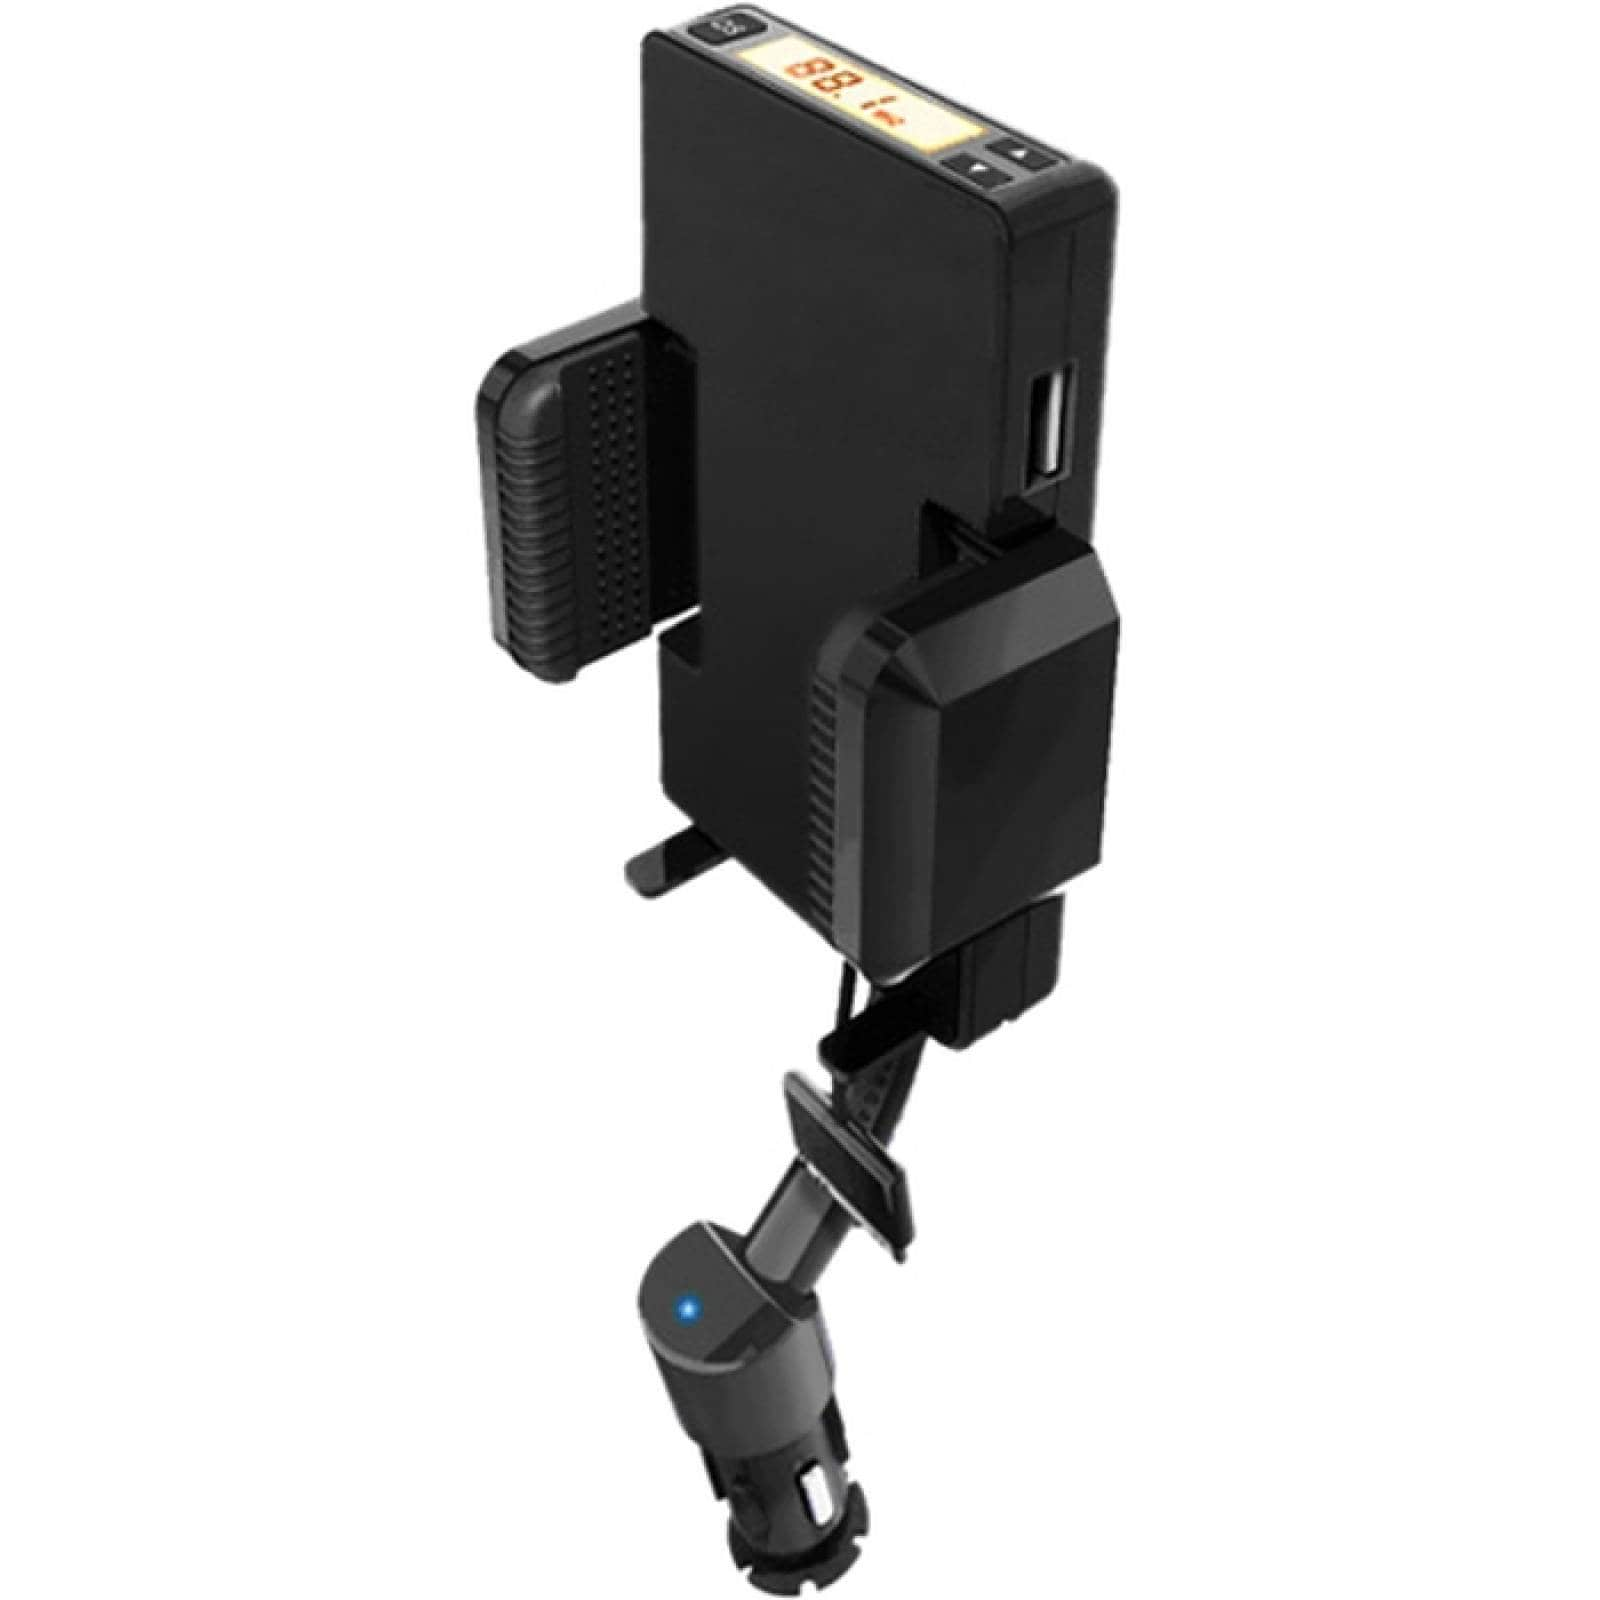 Kit manos libres para telefrico Premiertek  USB